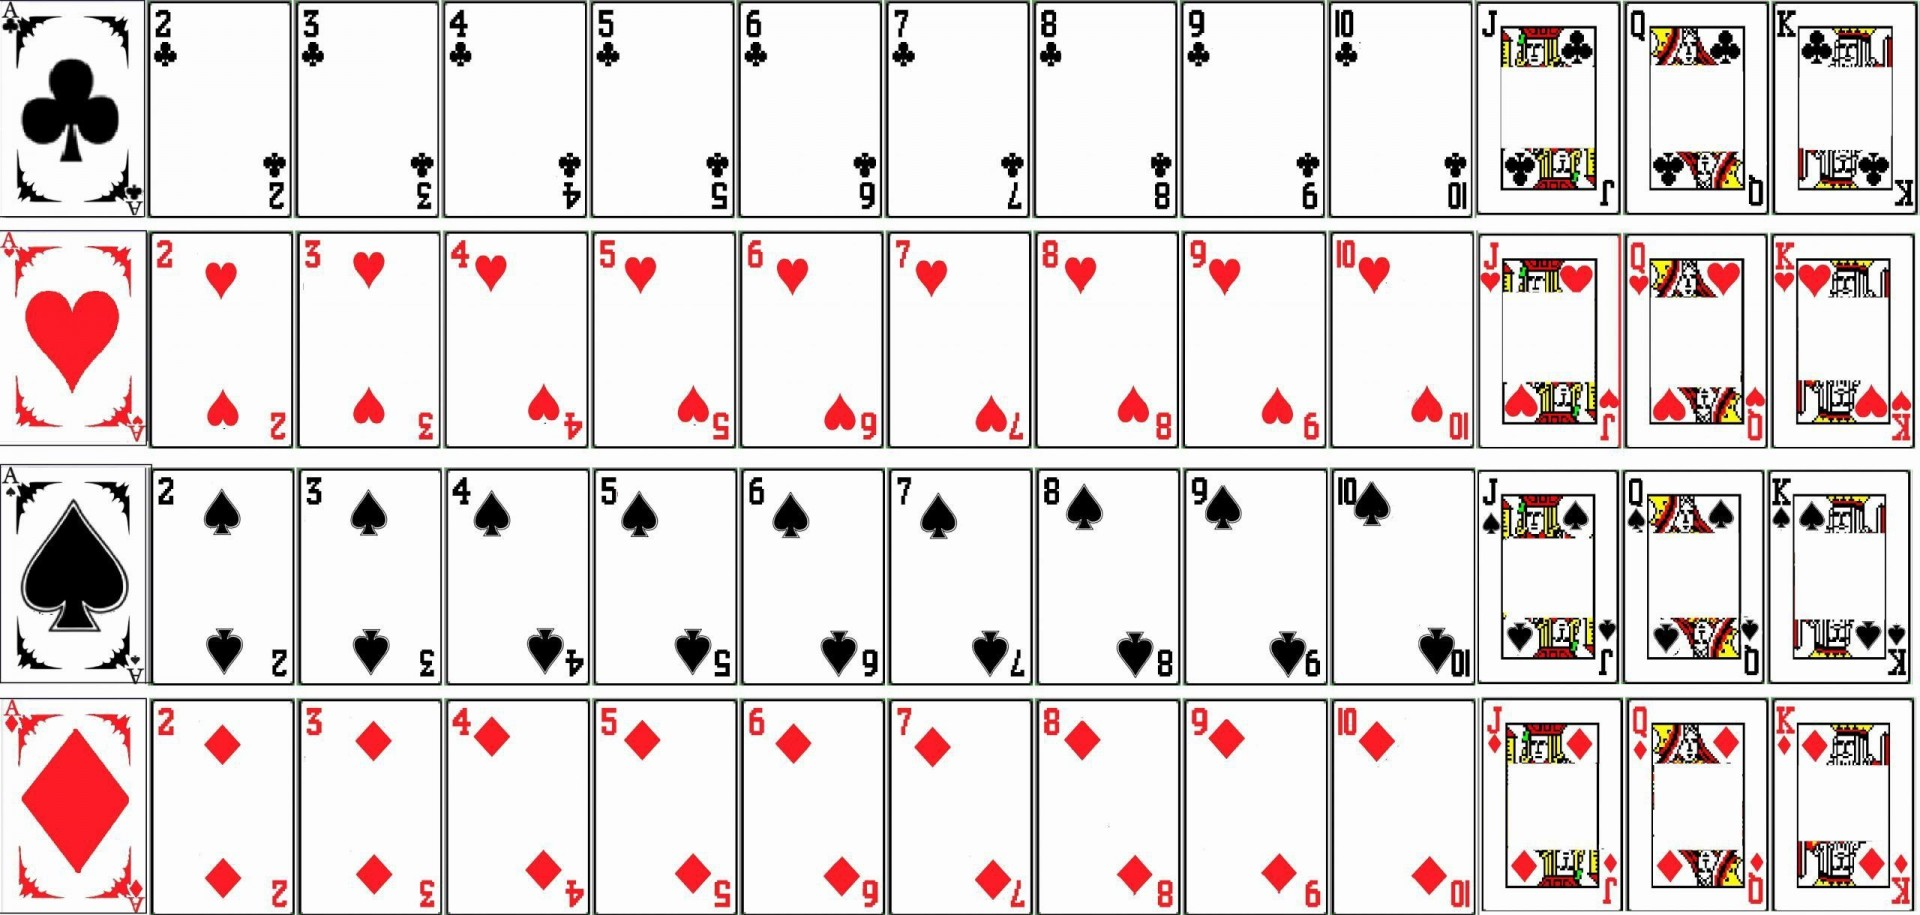 002 Sensational Blank Playing Card Template Word Inspiration 1920